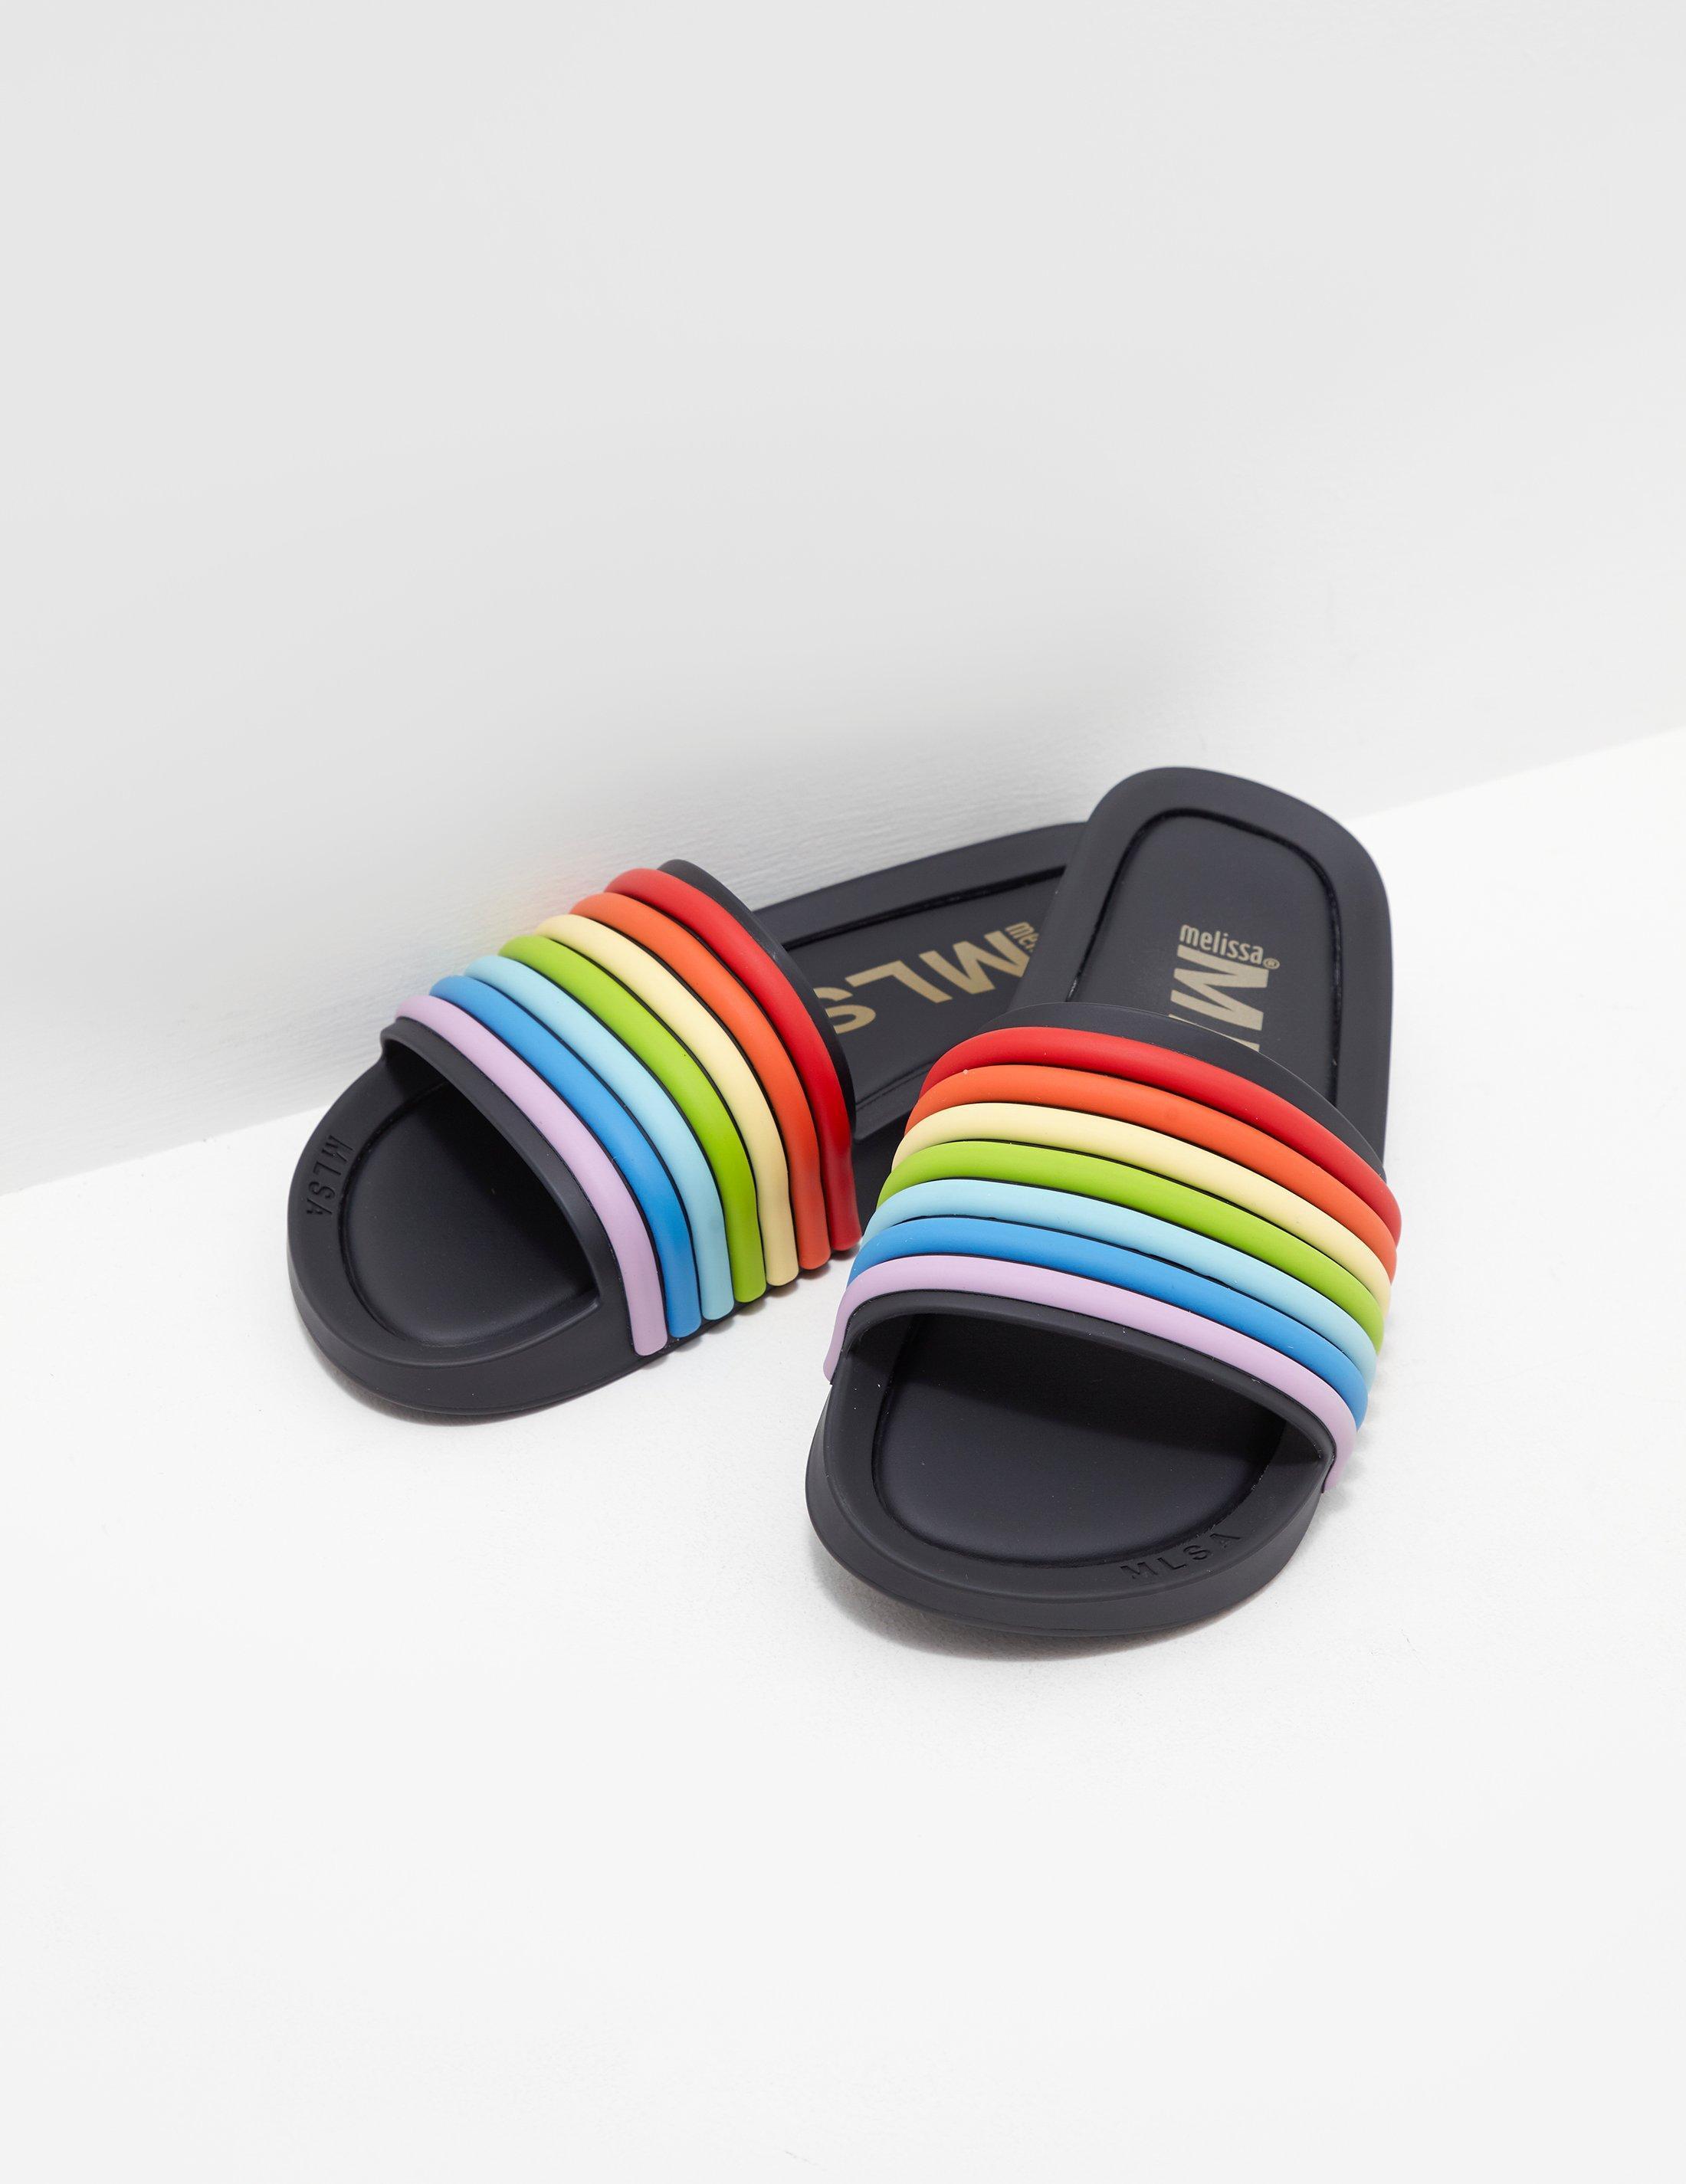 8d9c359eac6 Melissa - Rainbow Beach Slides Black - Lyst. View fullscreen